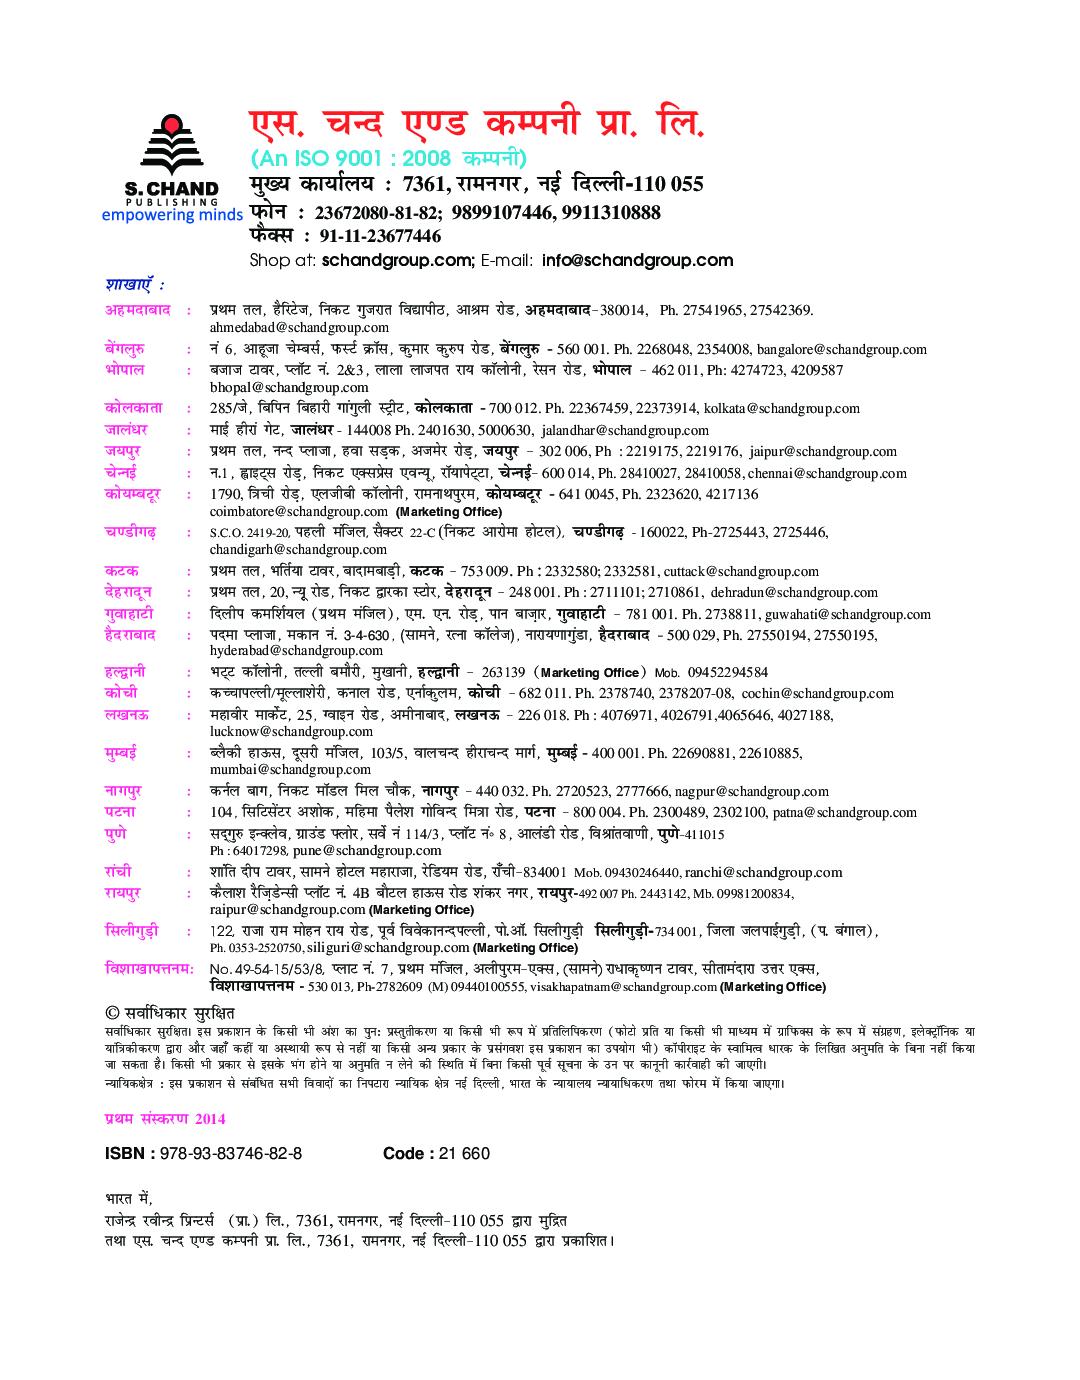 इंद्रधनुष हिंदी पाठमाला प्रवेशिका - 2 - Page 3